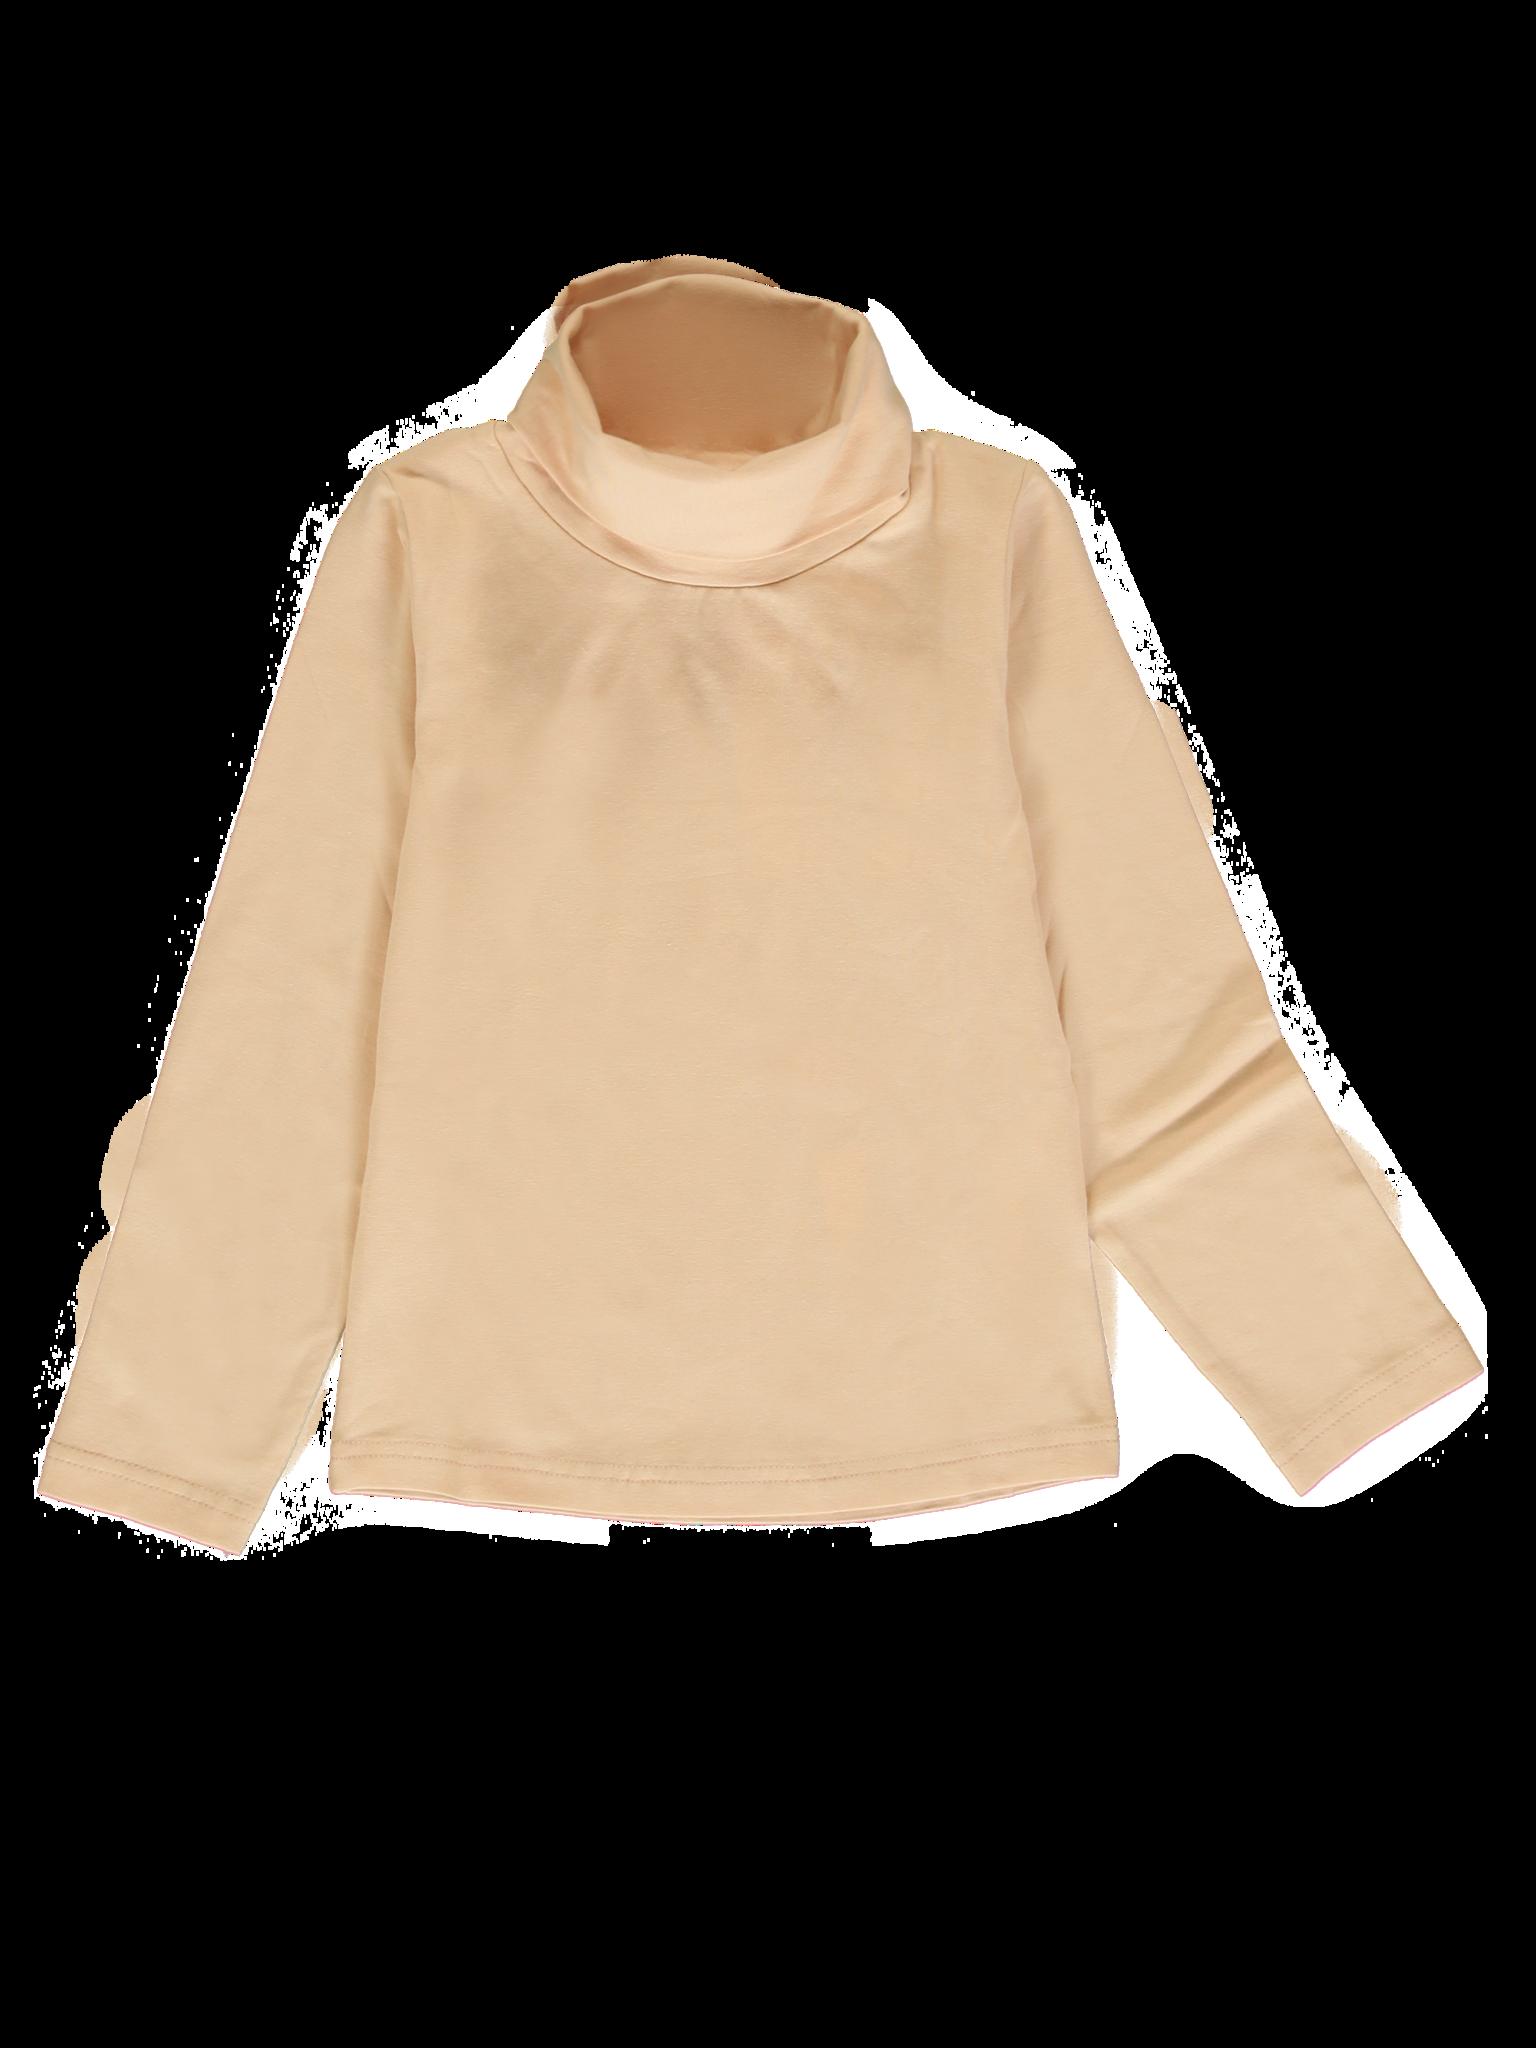 All Brands | Winterproducts Small Girls | Souspull | 24 pcs/box